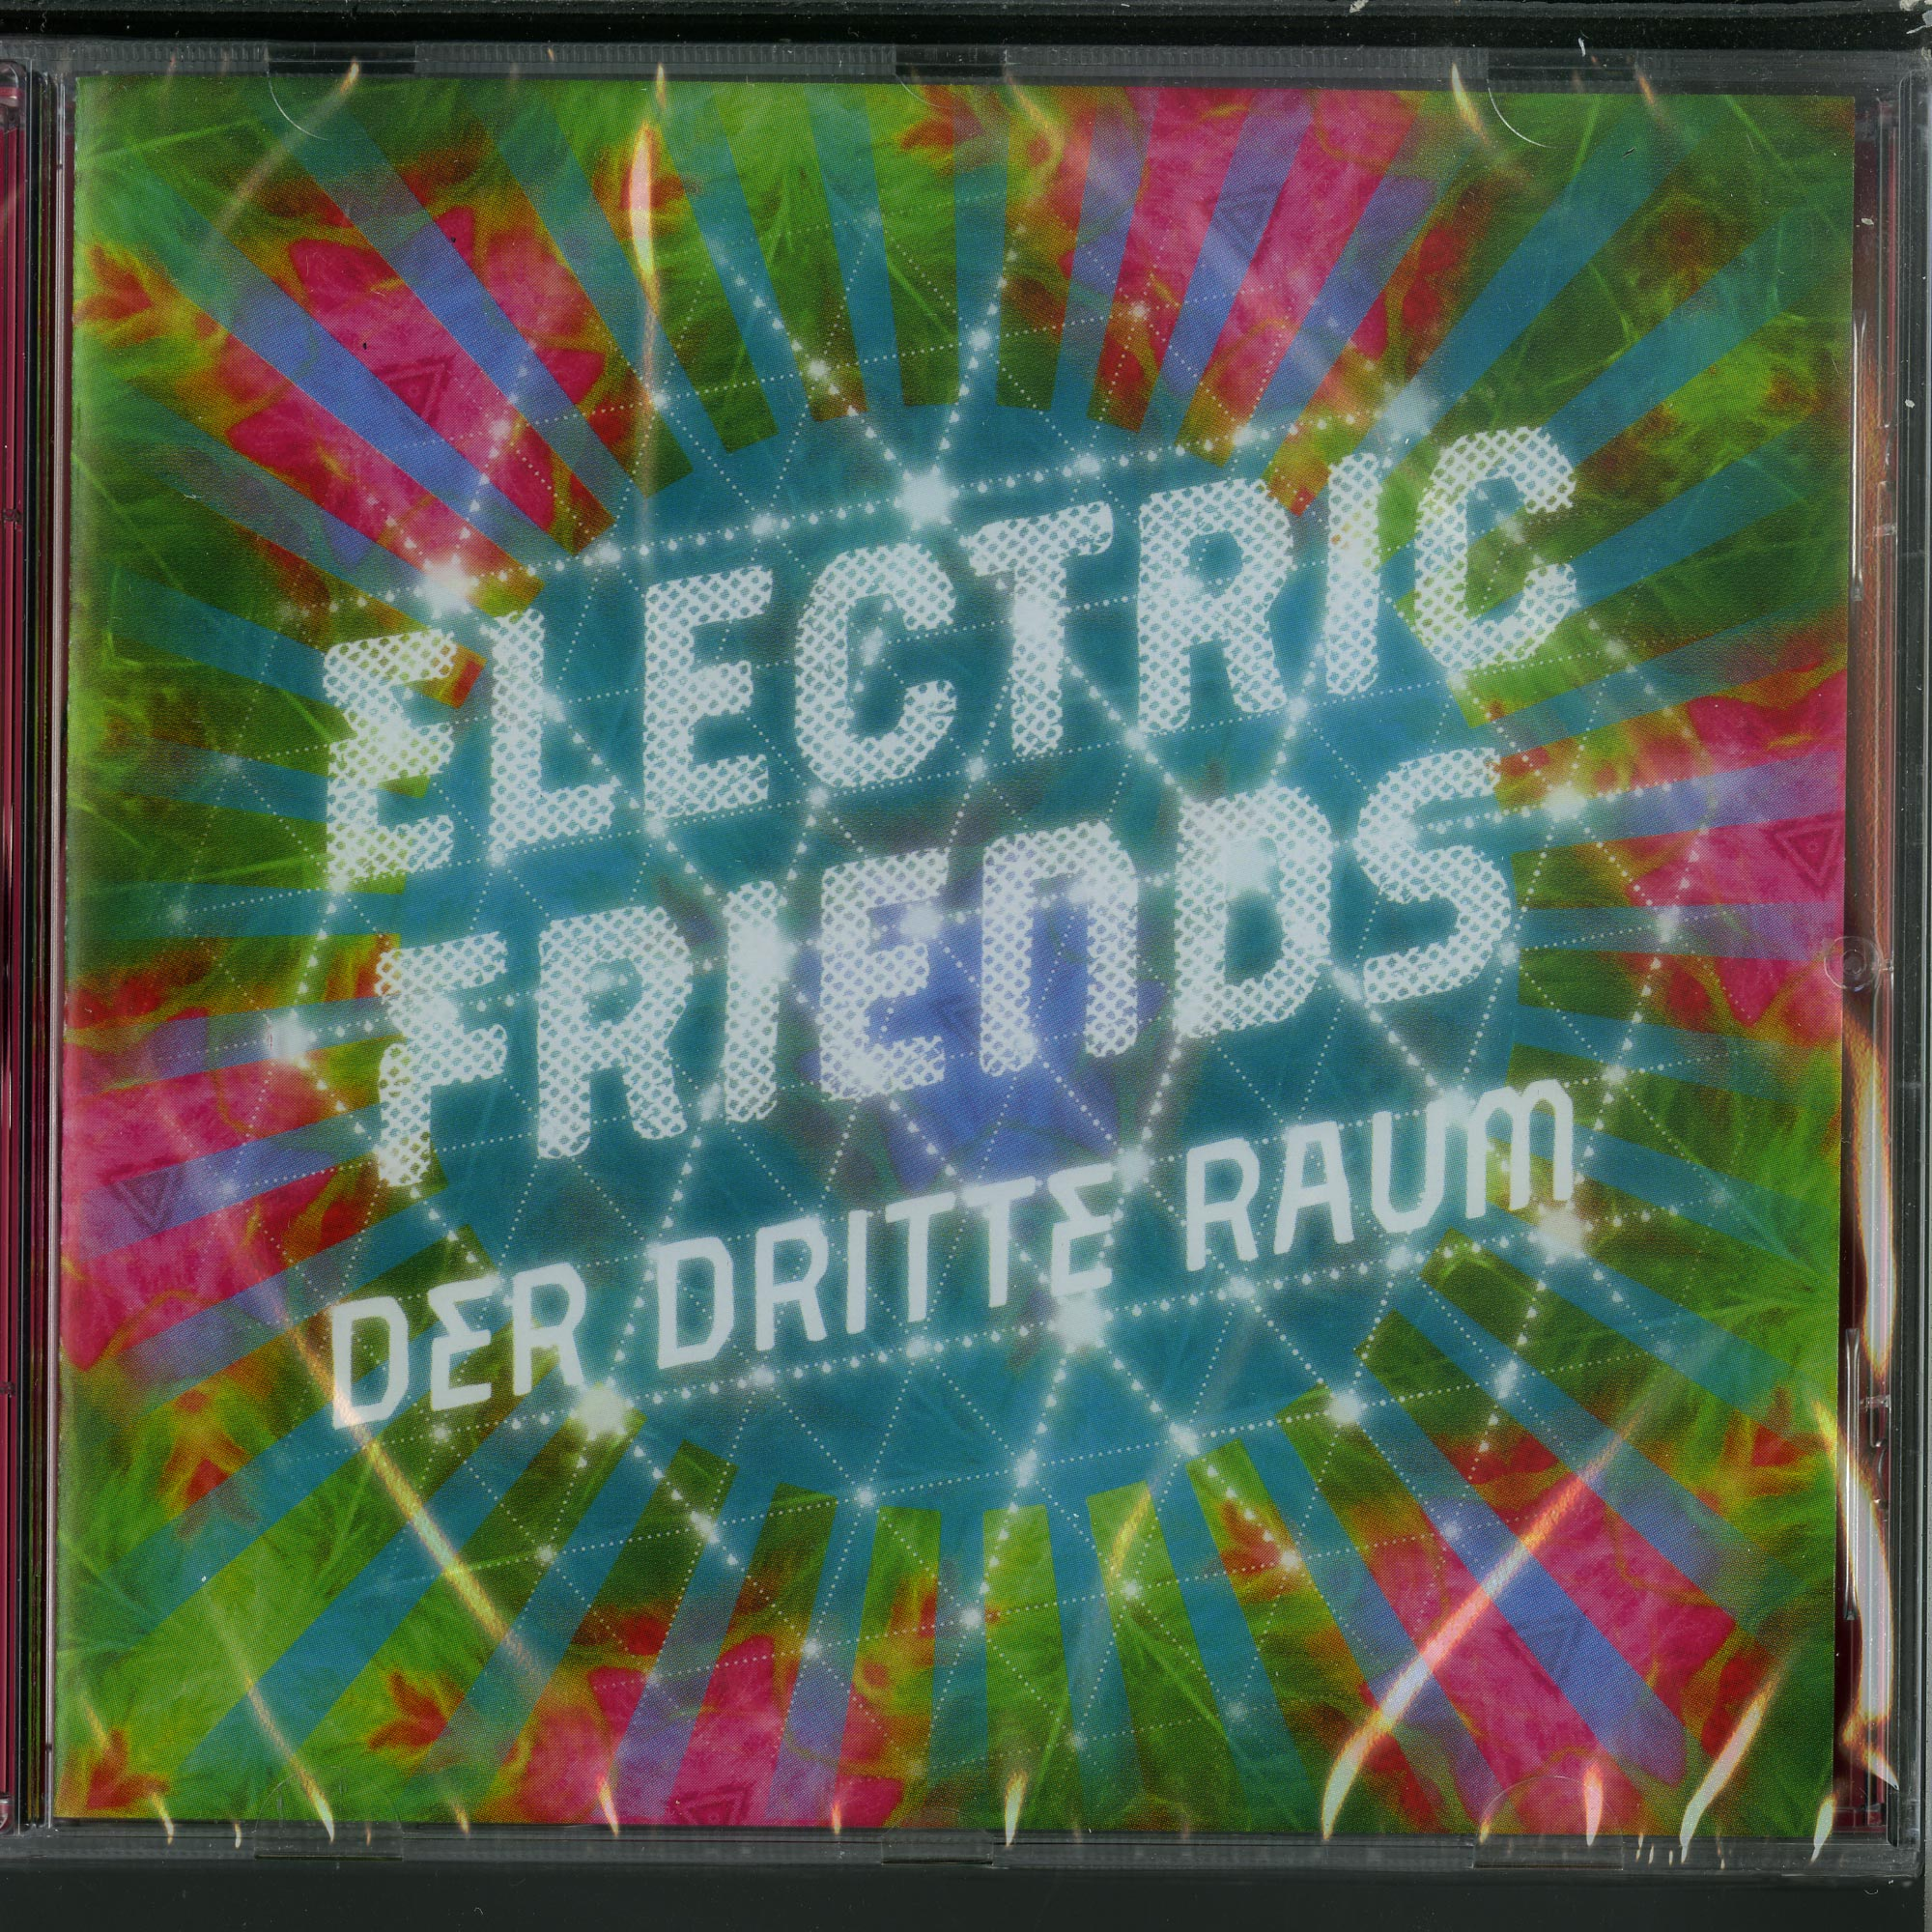 Der Dritte Raum - ELECTRIC FRIENDS